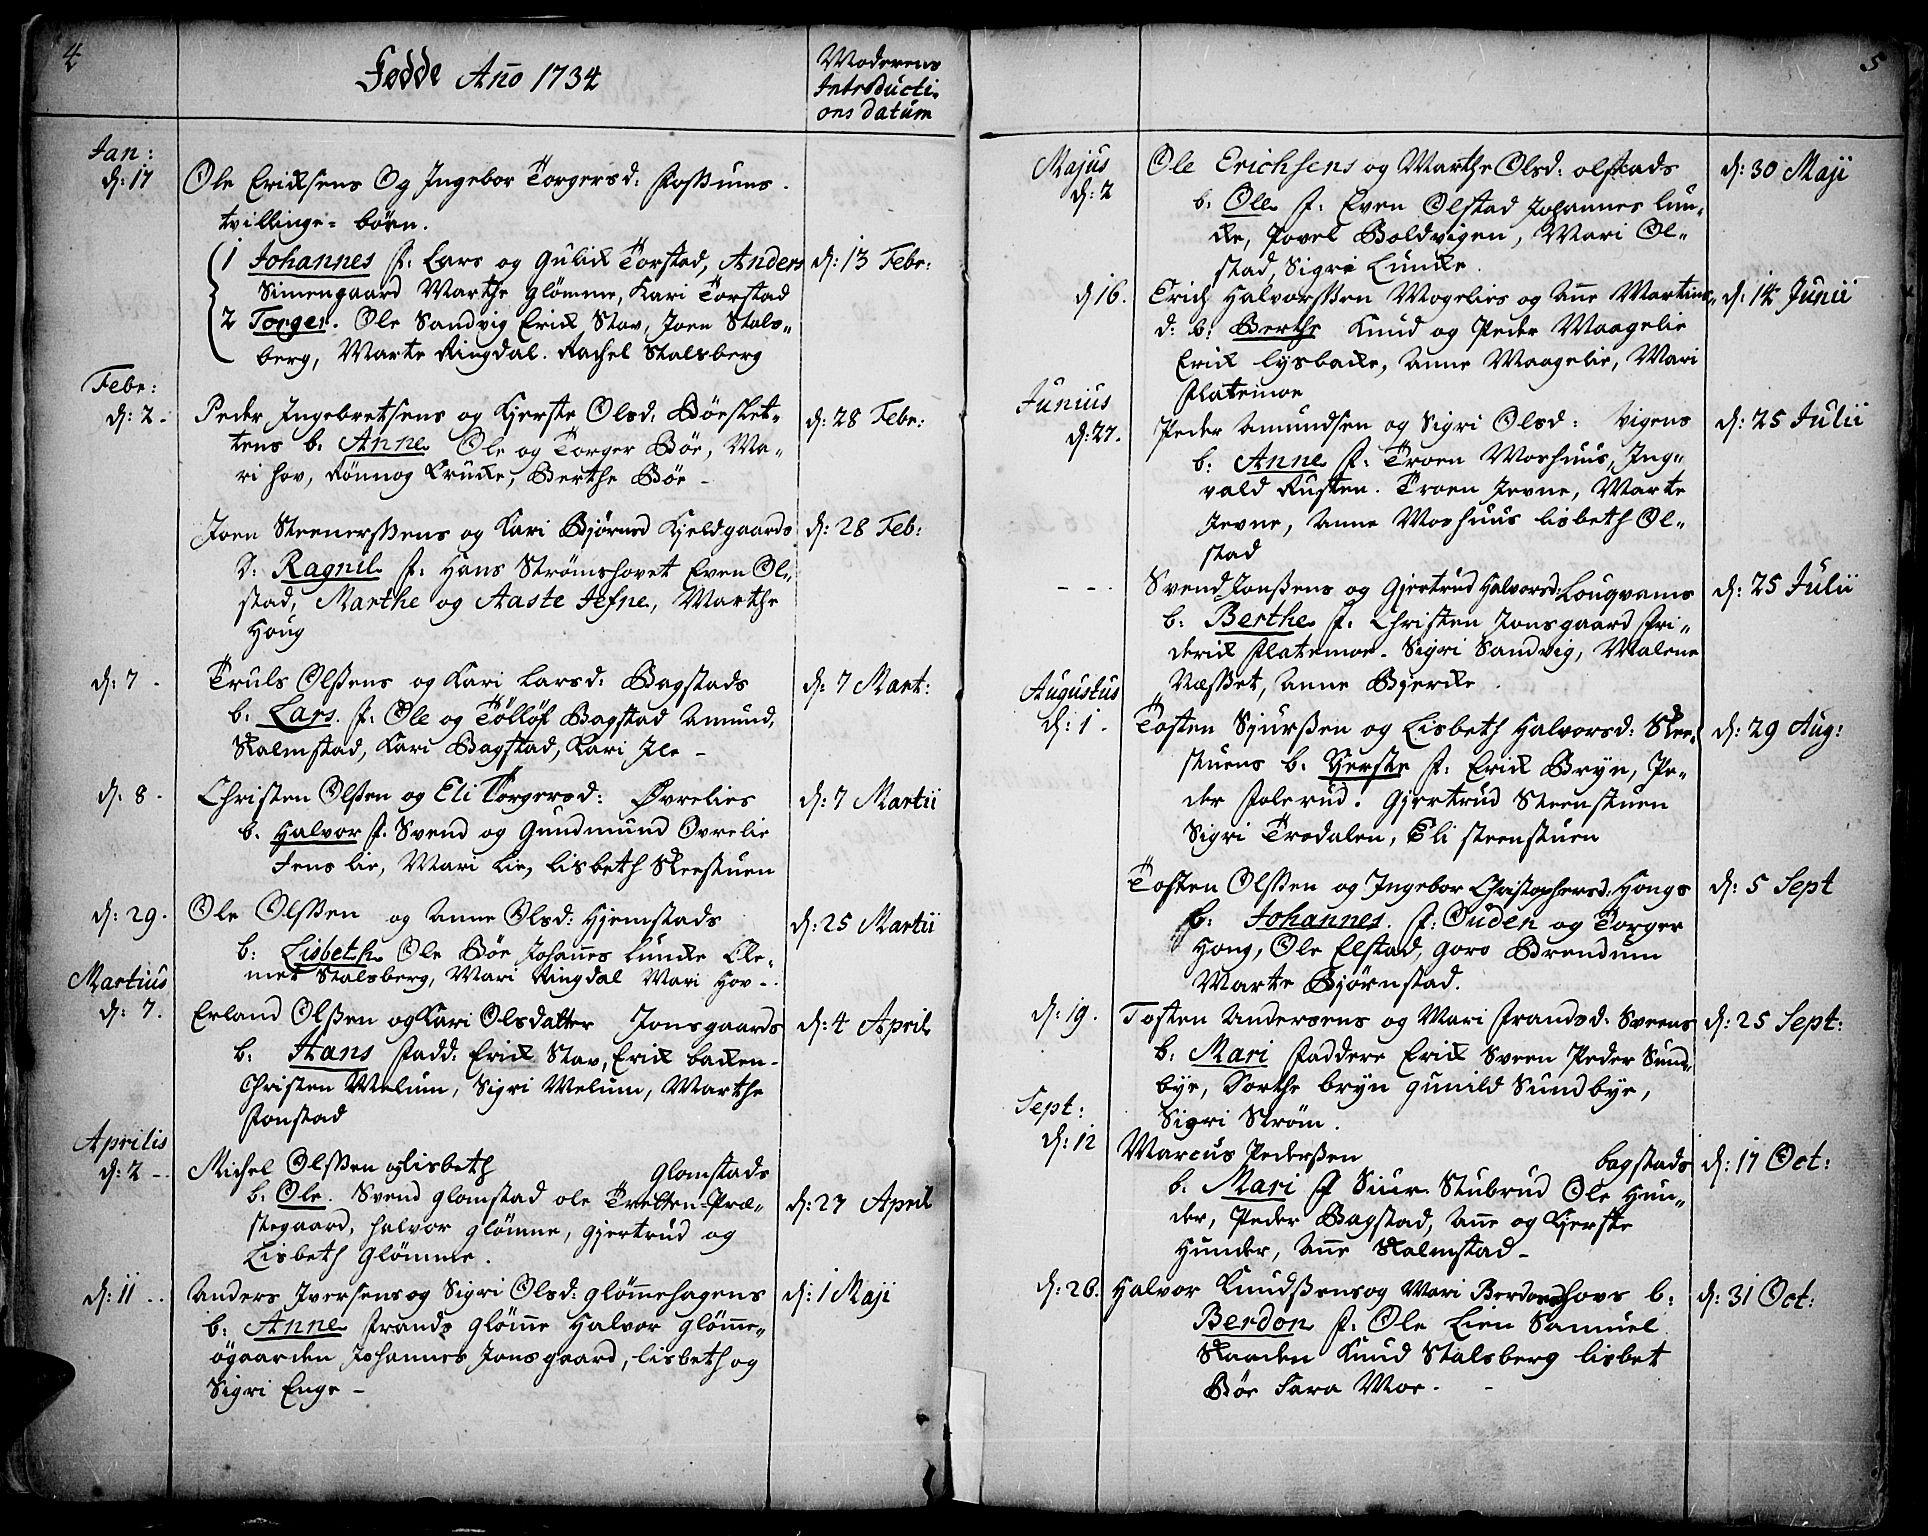 SAH, Øyer prestekontor, Ministerialbok nr. 2, 1733-1784, s. 4-5